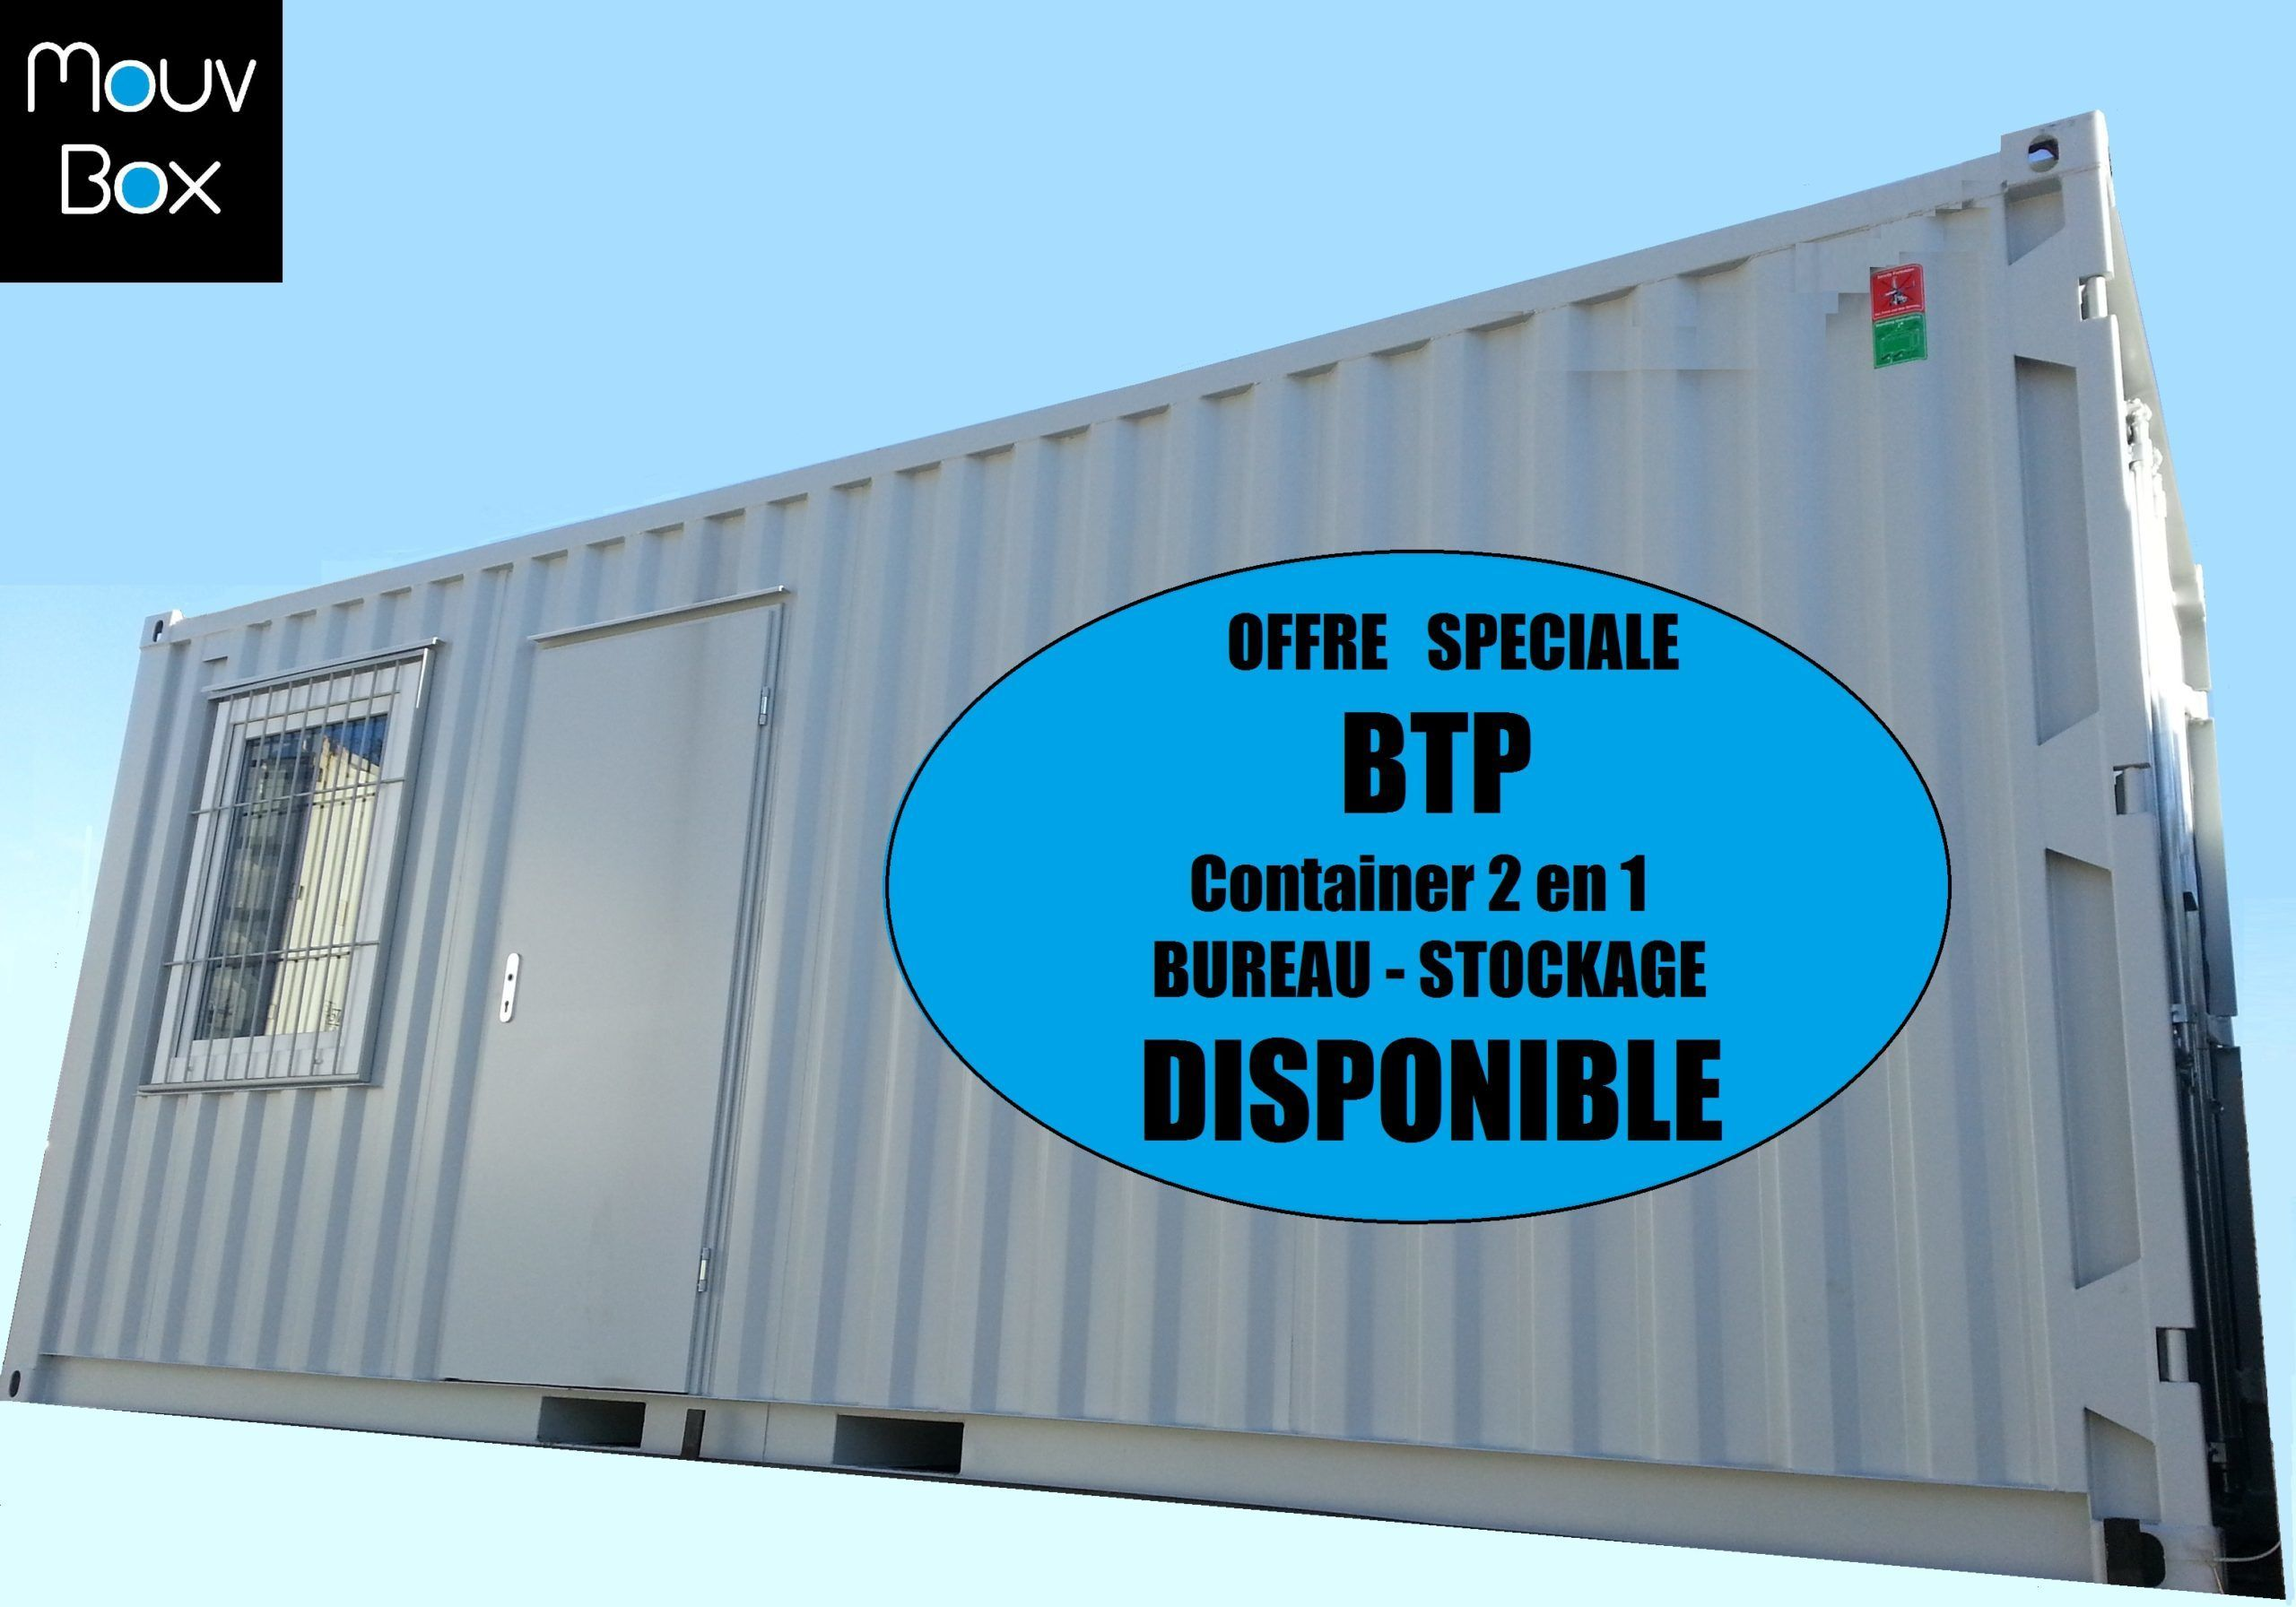 vente-conteneur-container 20' dry-neuf-btp-stockage-bureau-mouvbox